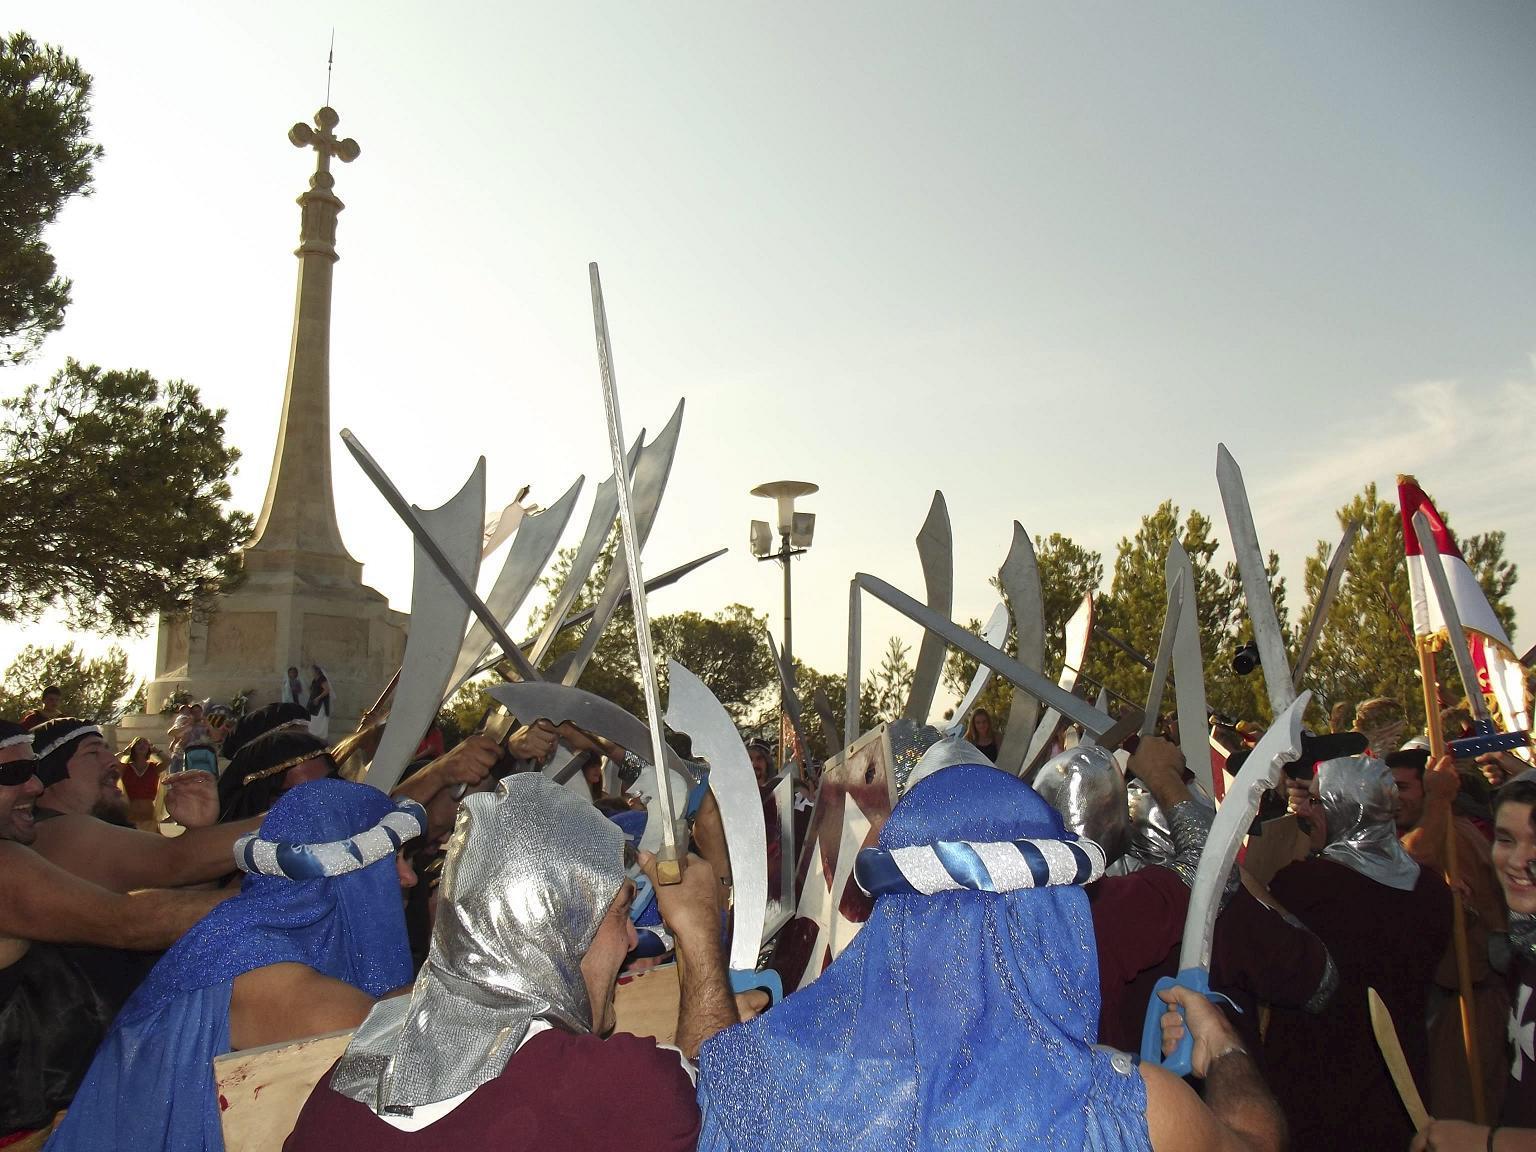 SANTA PONÇA - CELEBRACION DE LA VICTORIA DEL REI EN JAUME I CONTRA LOS SARRACENOS.